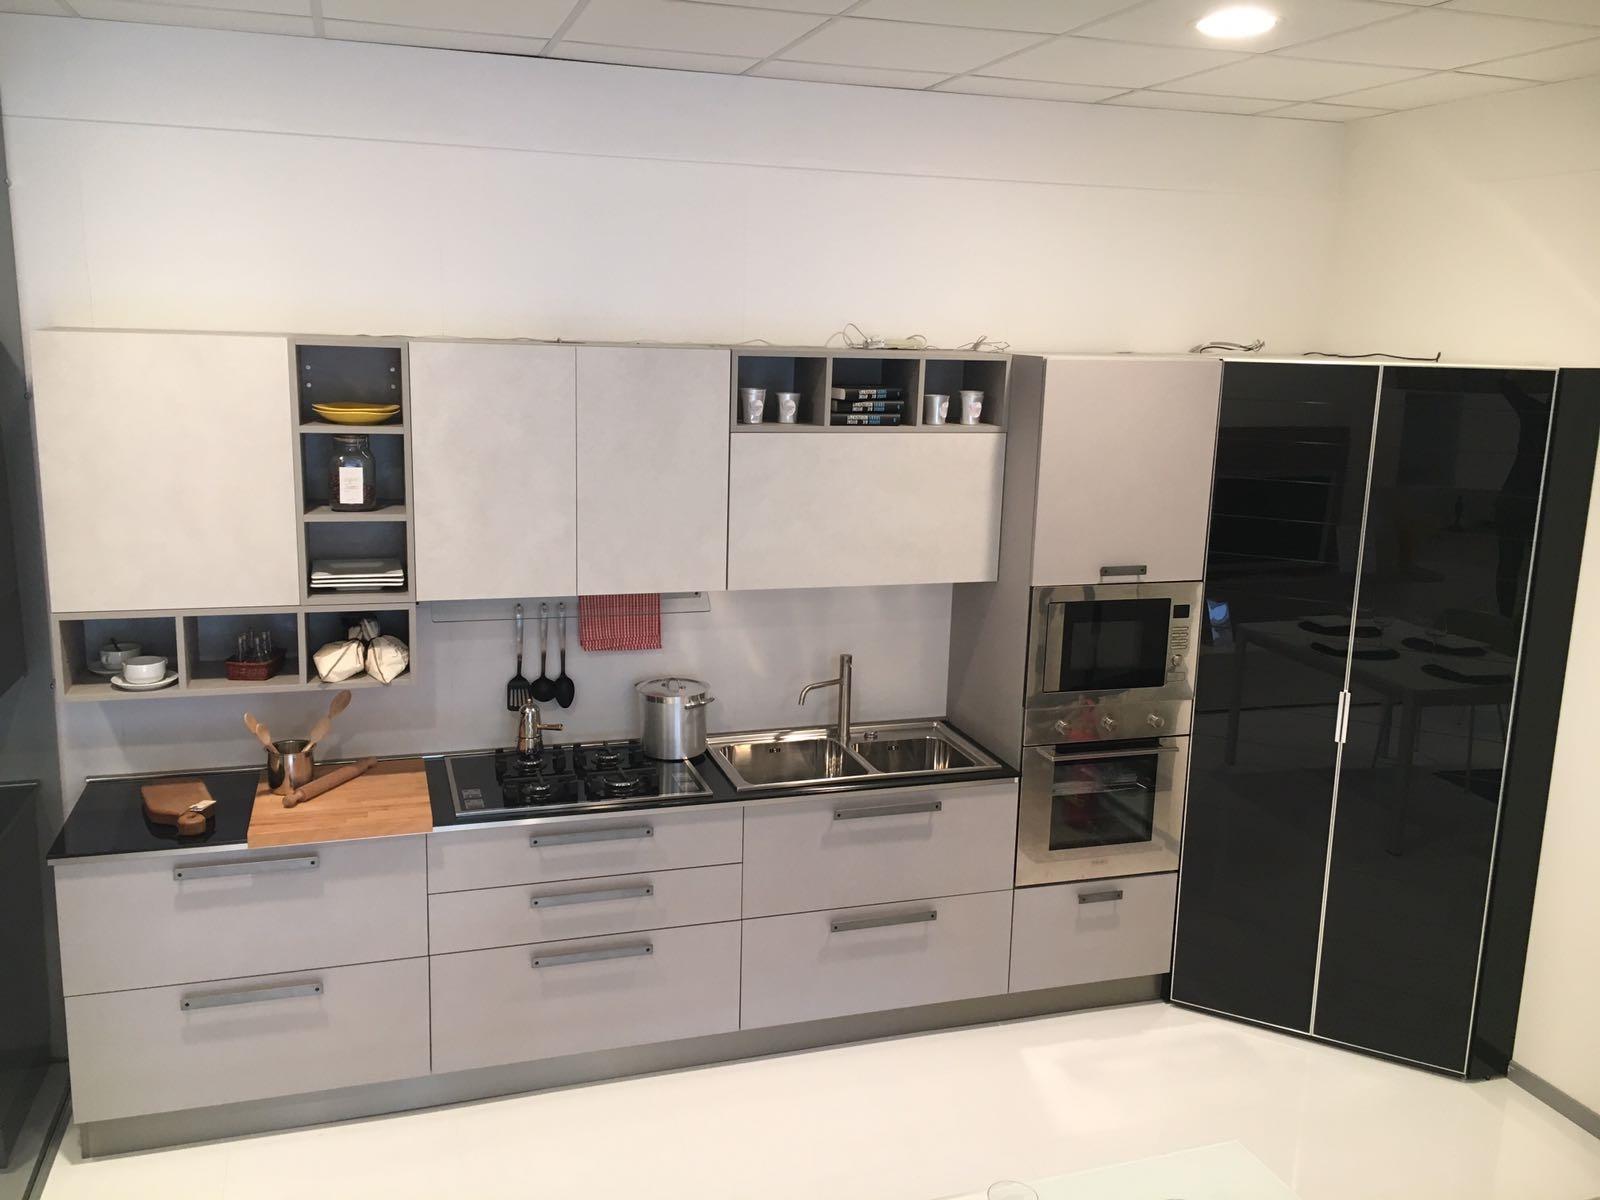 Emejing cucine dibiesse prezzi ideas design ideas 2017 - Dibiesse cucine opinioni ...